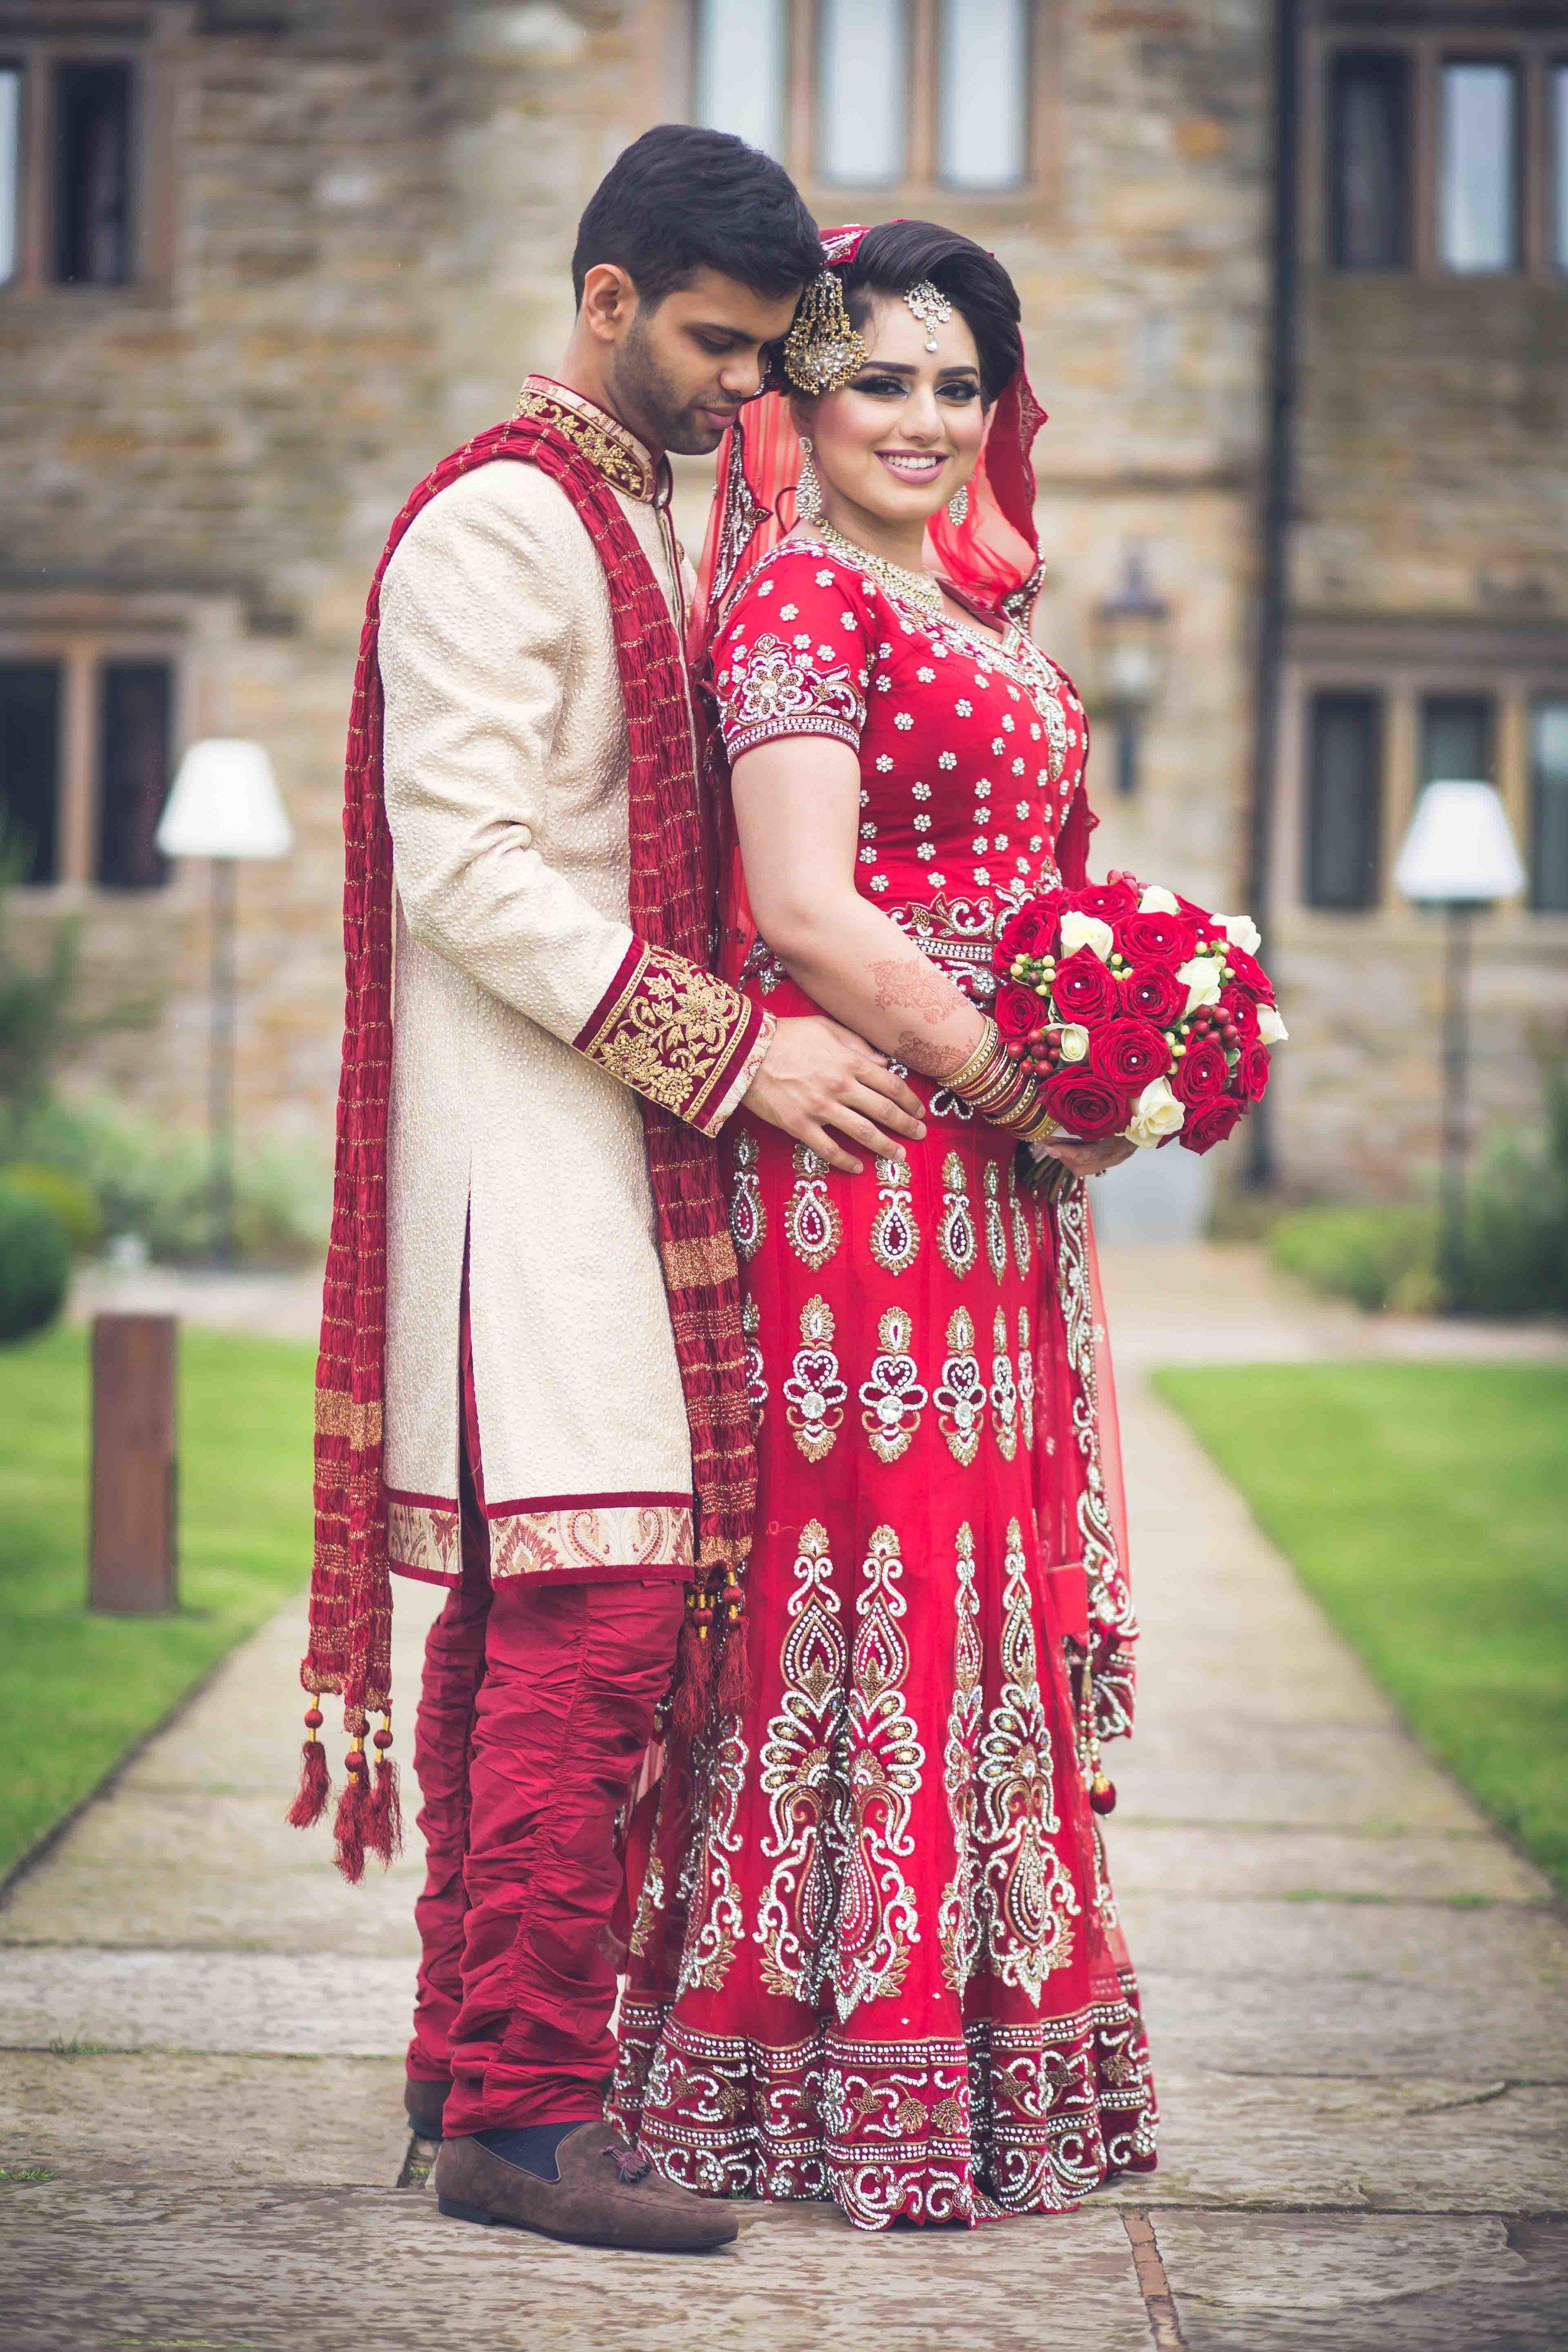 Asian Wedding Photographer Opu Sultan Photography Lyme Park Scotland Edinburgh Glasgow London Manchester Liverpool Birmingham Wedding Photos prewed shoot Jams & Tams Blod-4.jpg